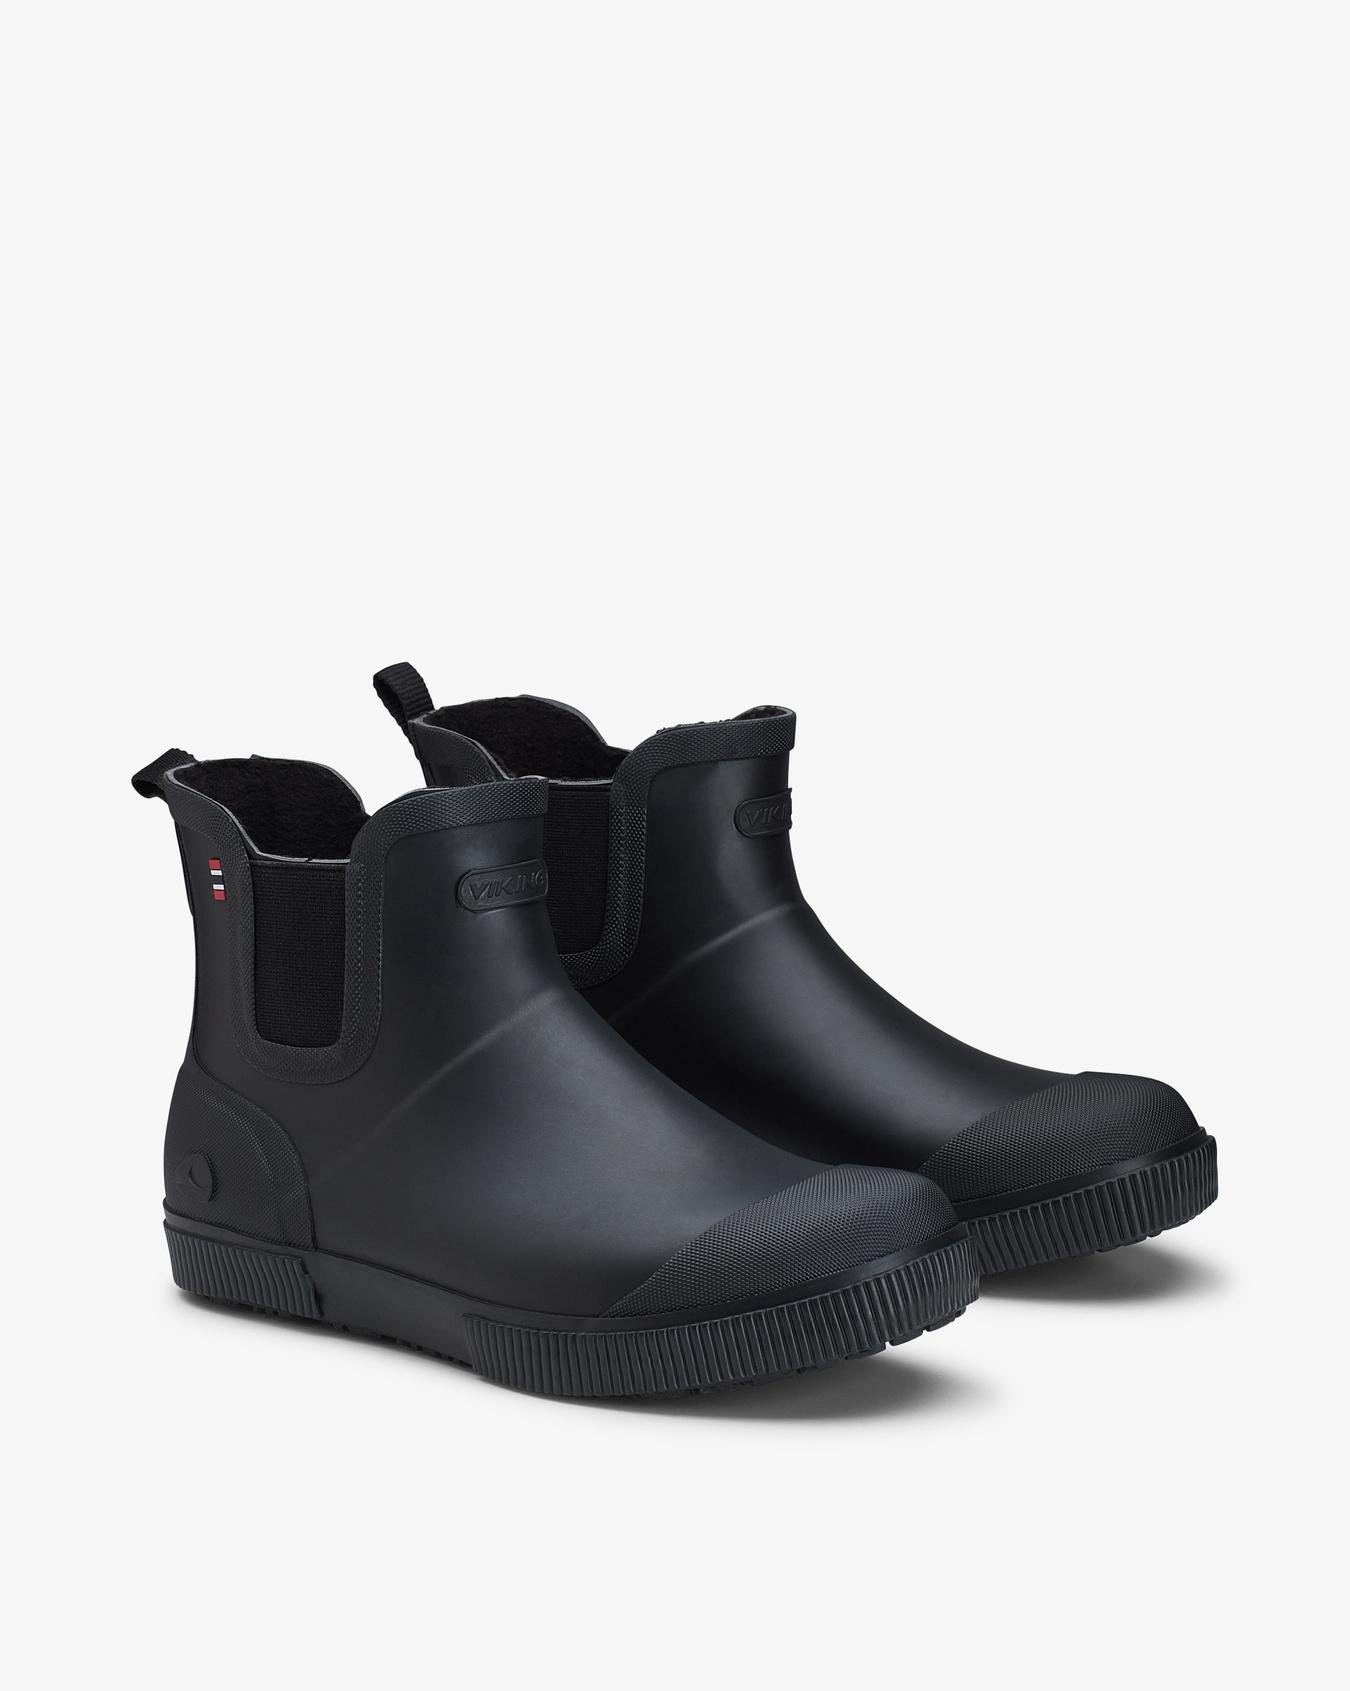 Praise Black Fleece Rubber Boots